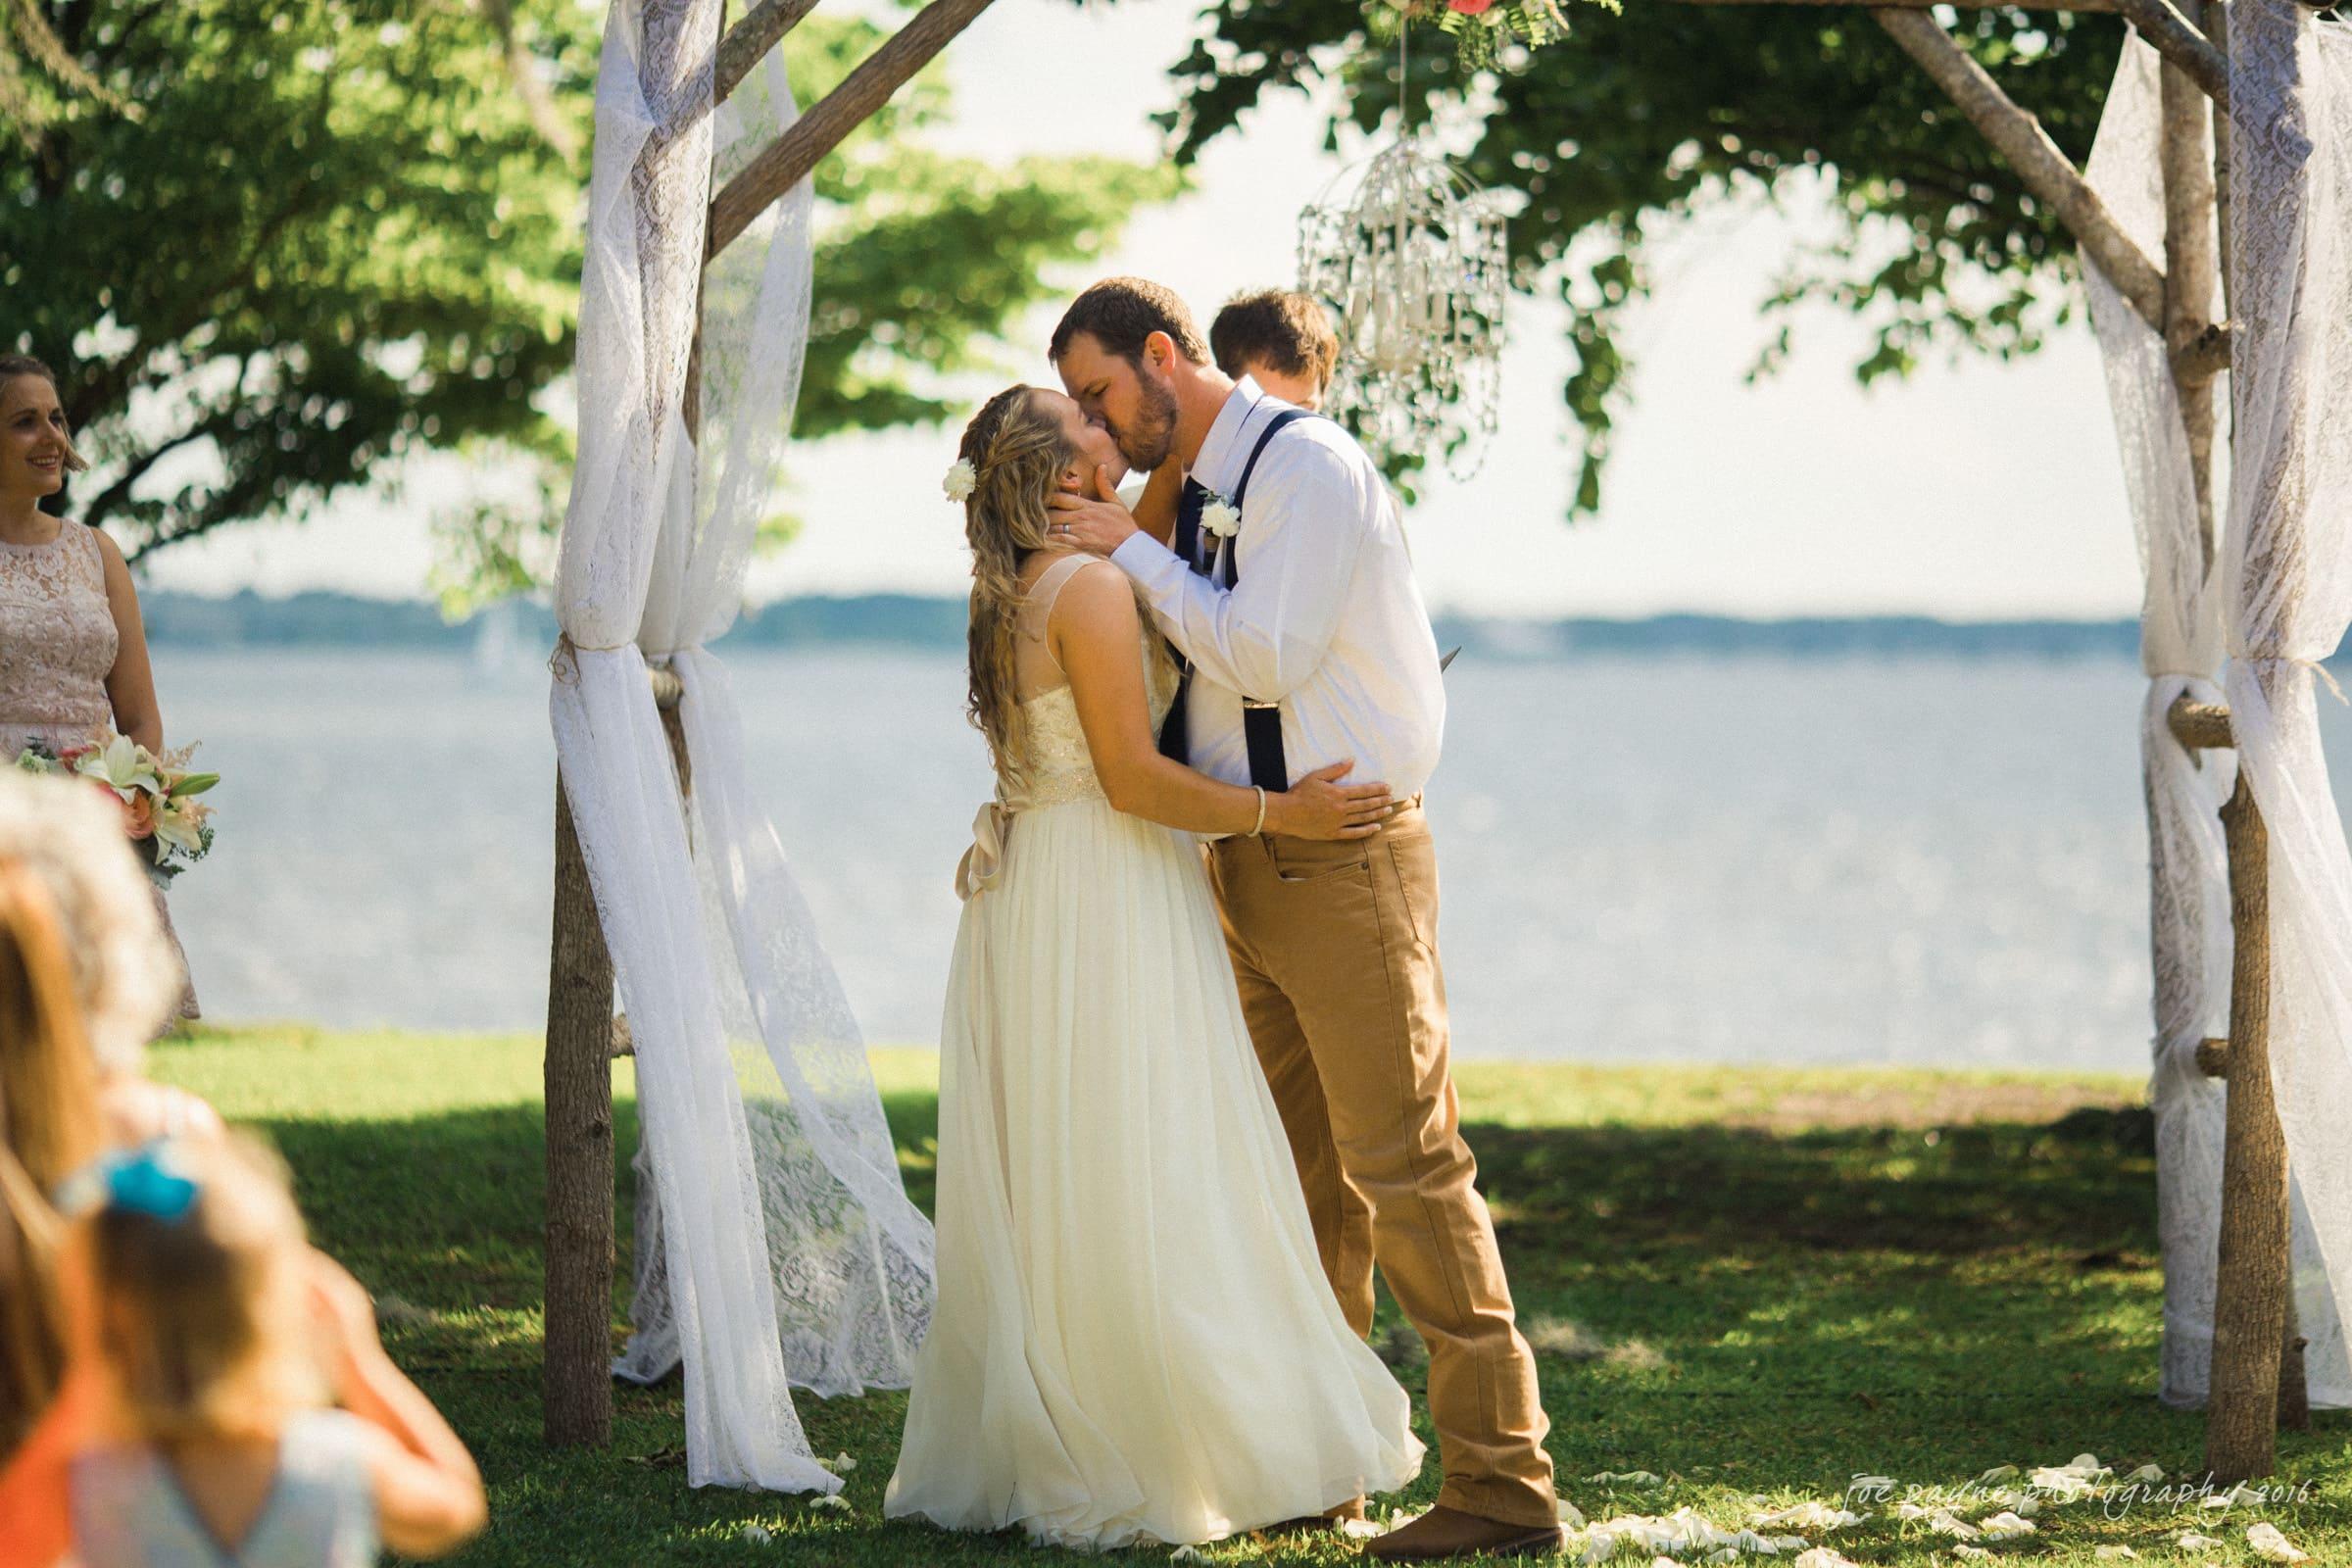 New Bern Wedding Photography - Jessica & Brinson-32